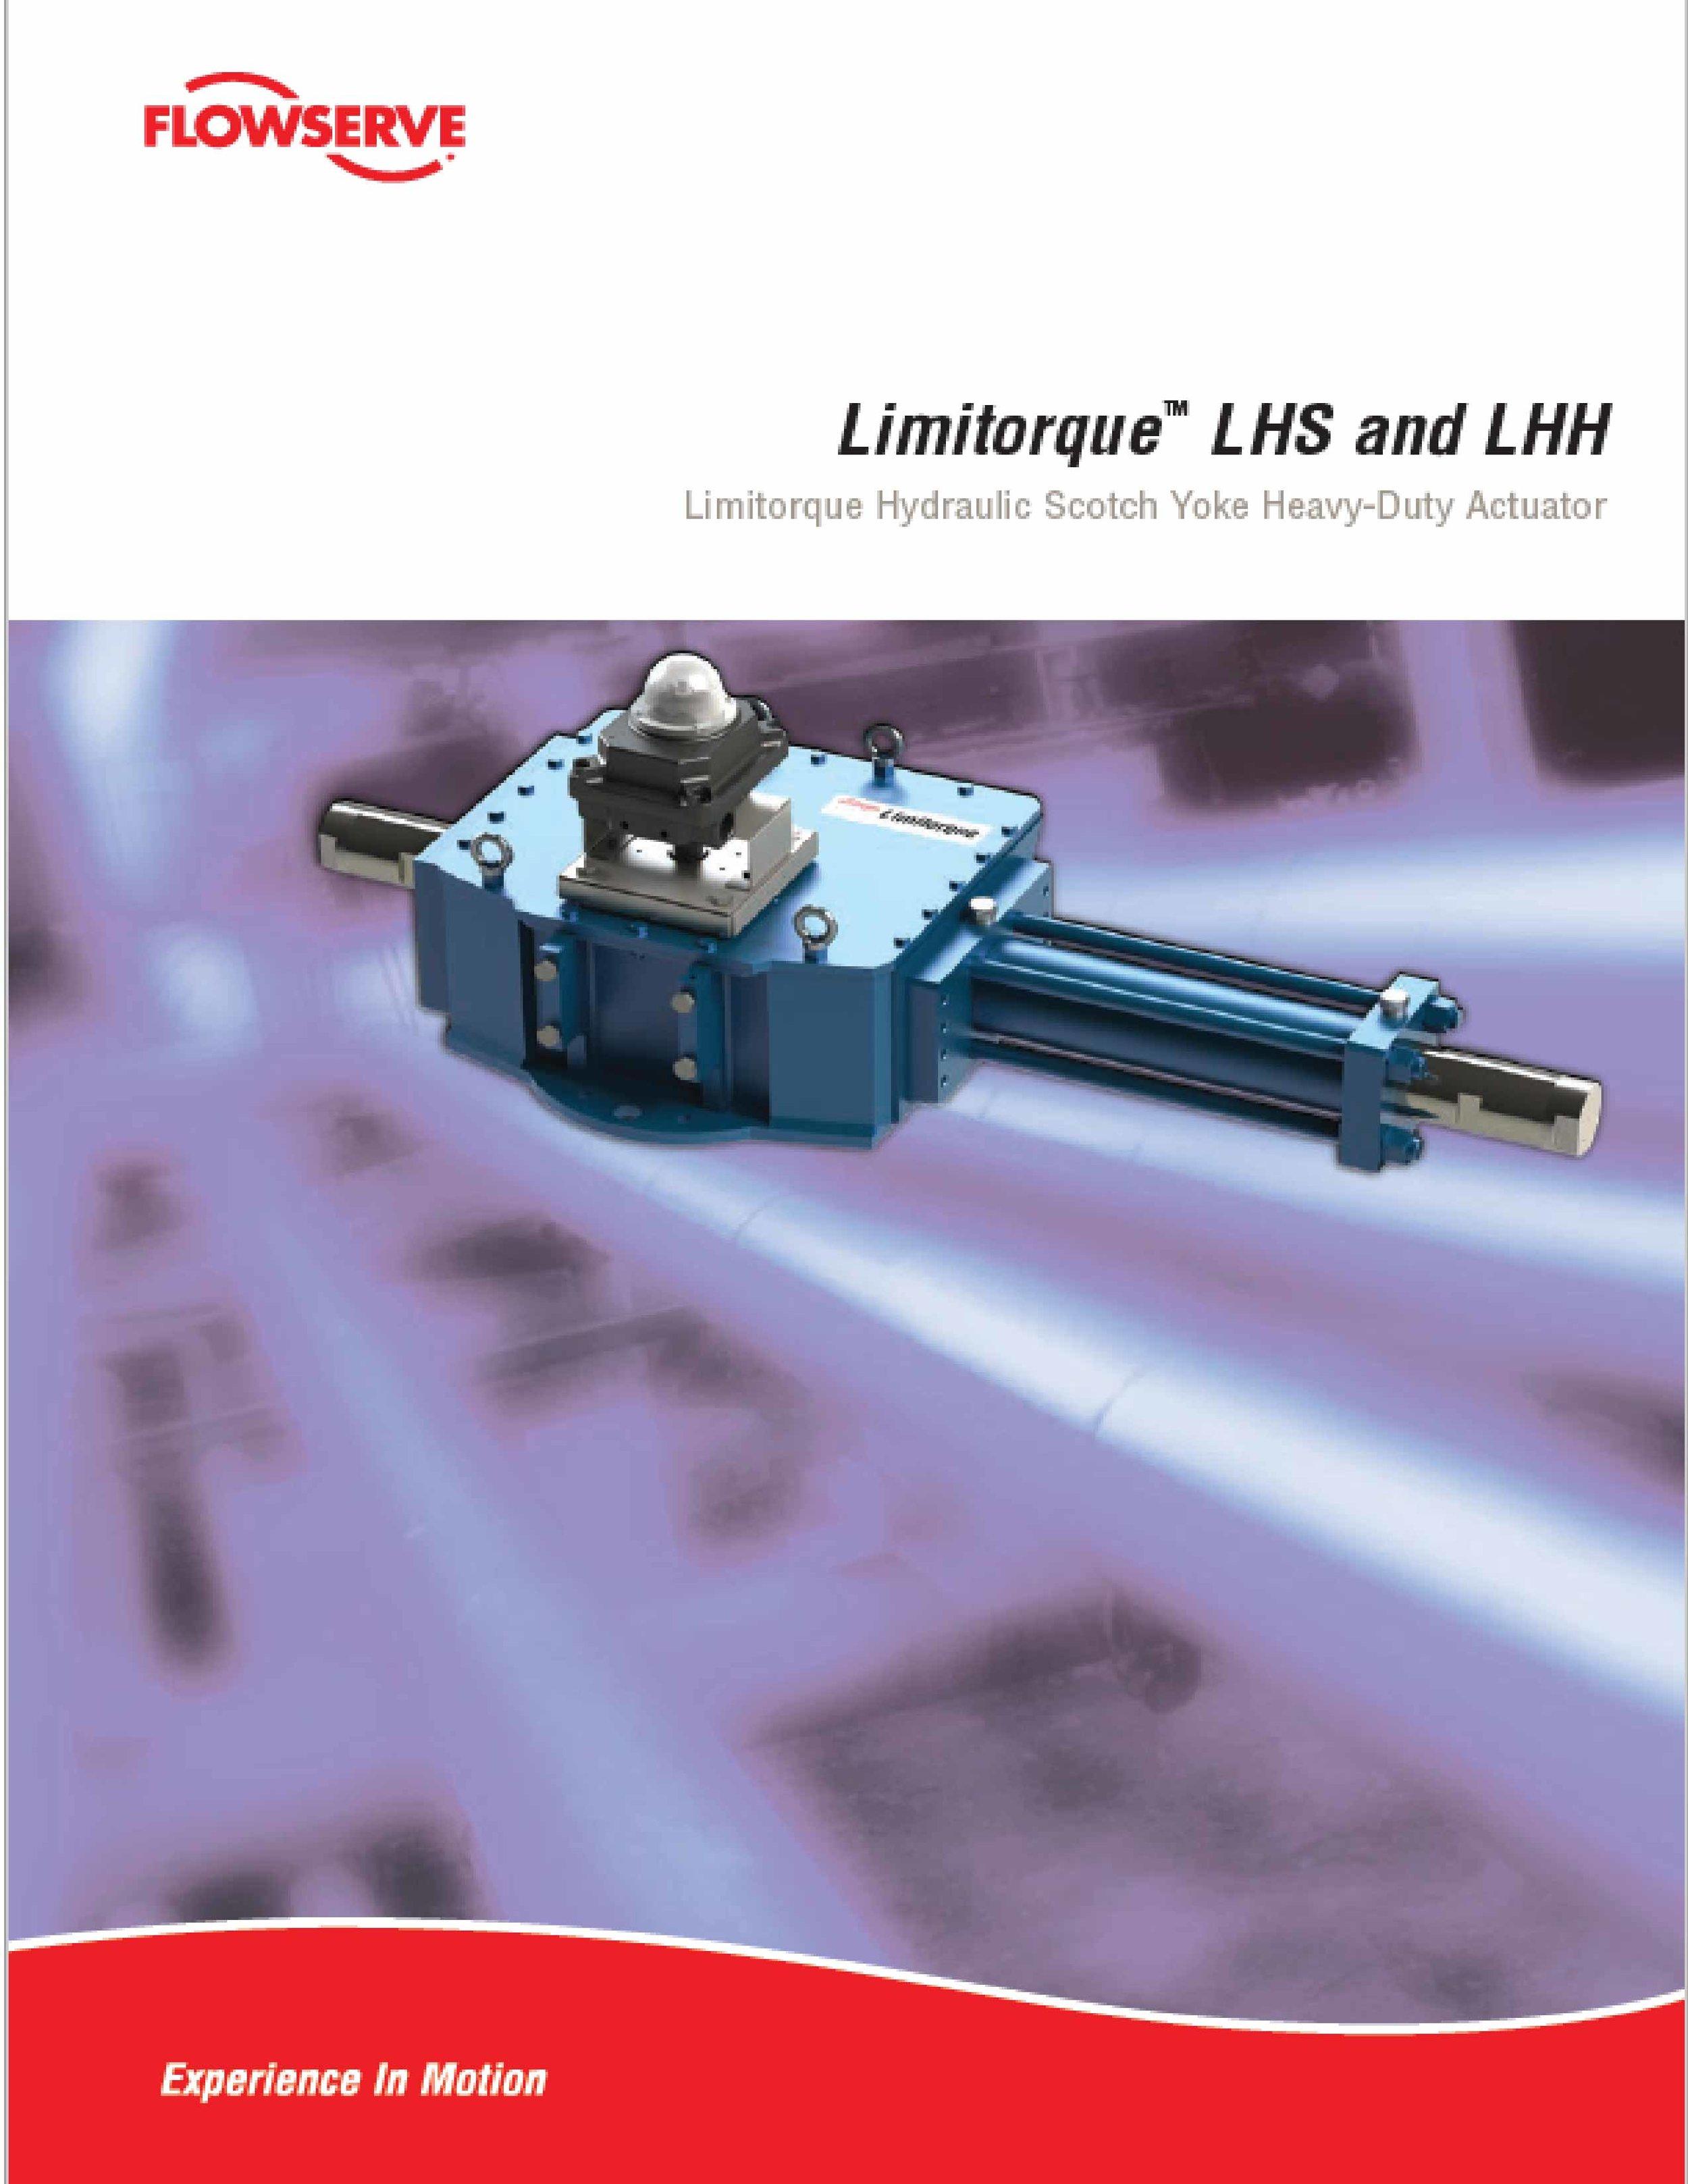 Limitorque_LHS_LHH-brochure-01.jpg